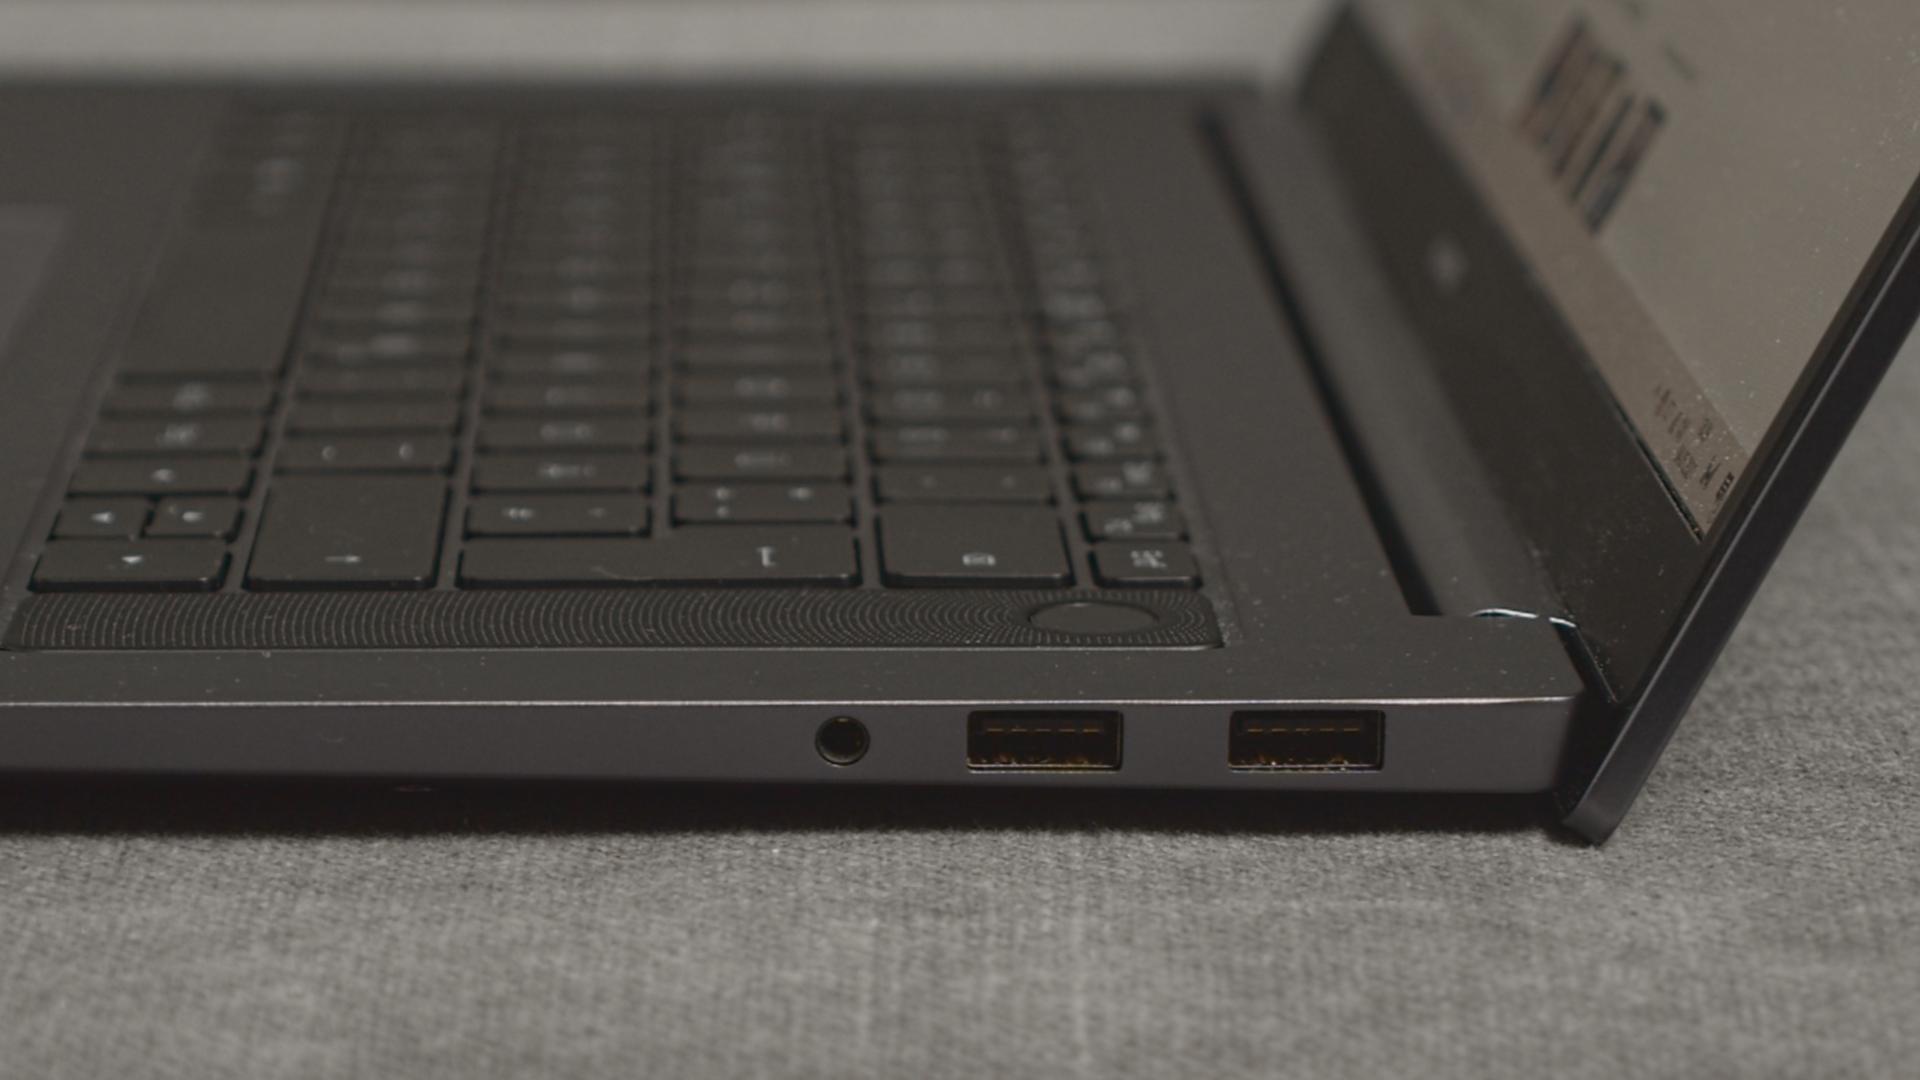 Huawei MateBook D16 keys